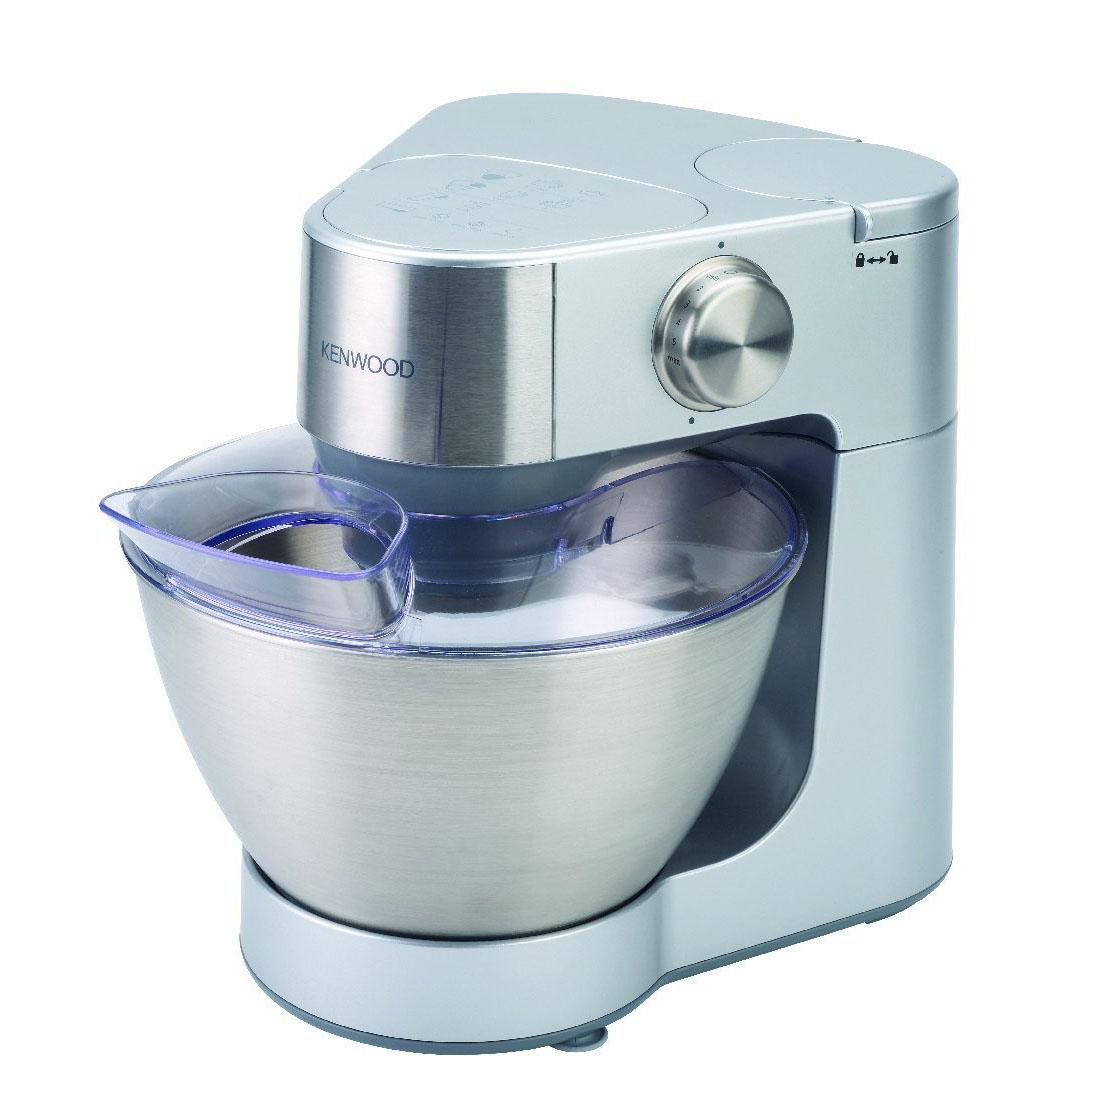 Kenwood Prospero Kitchen Machine KM240SI - Silver